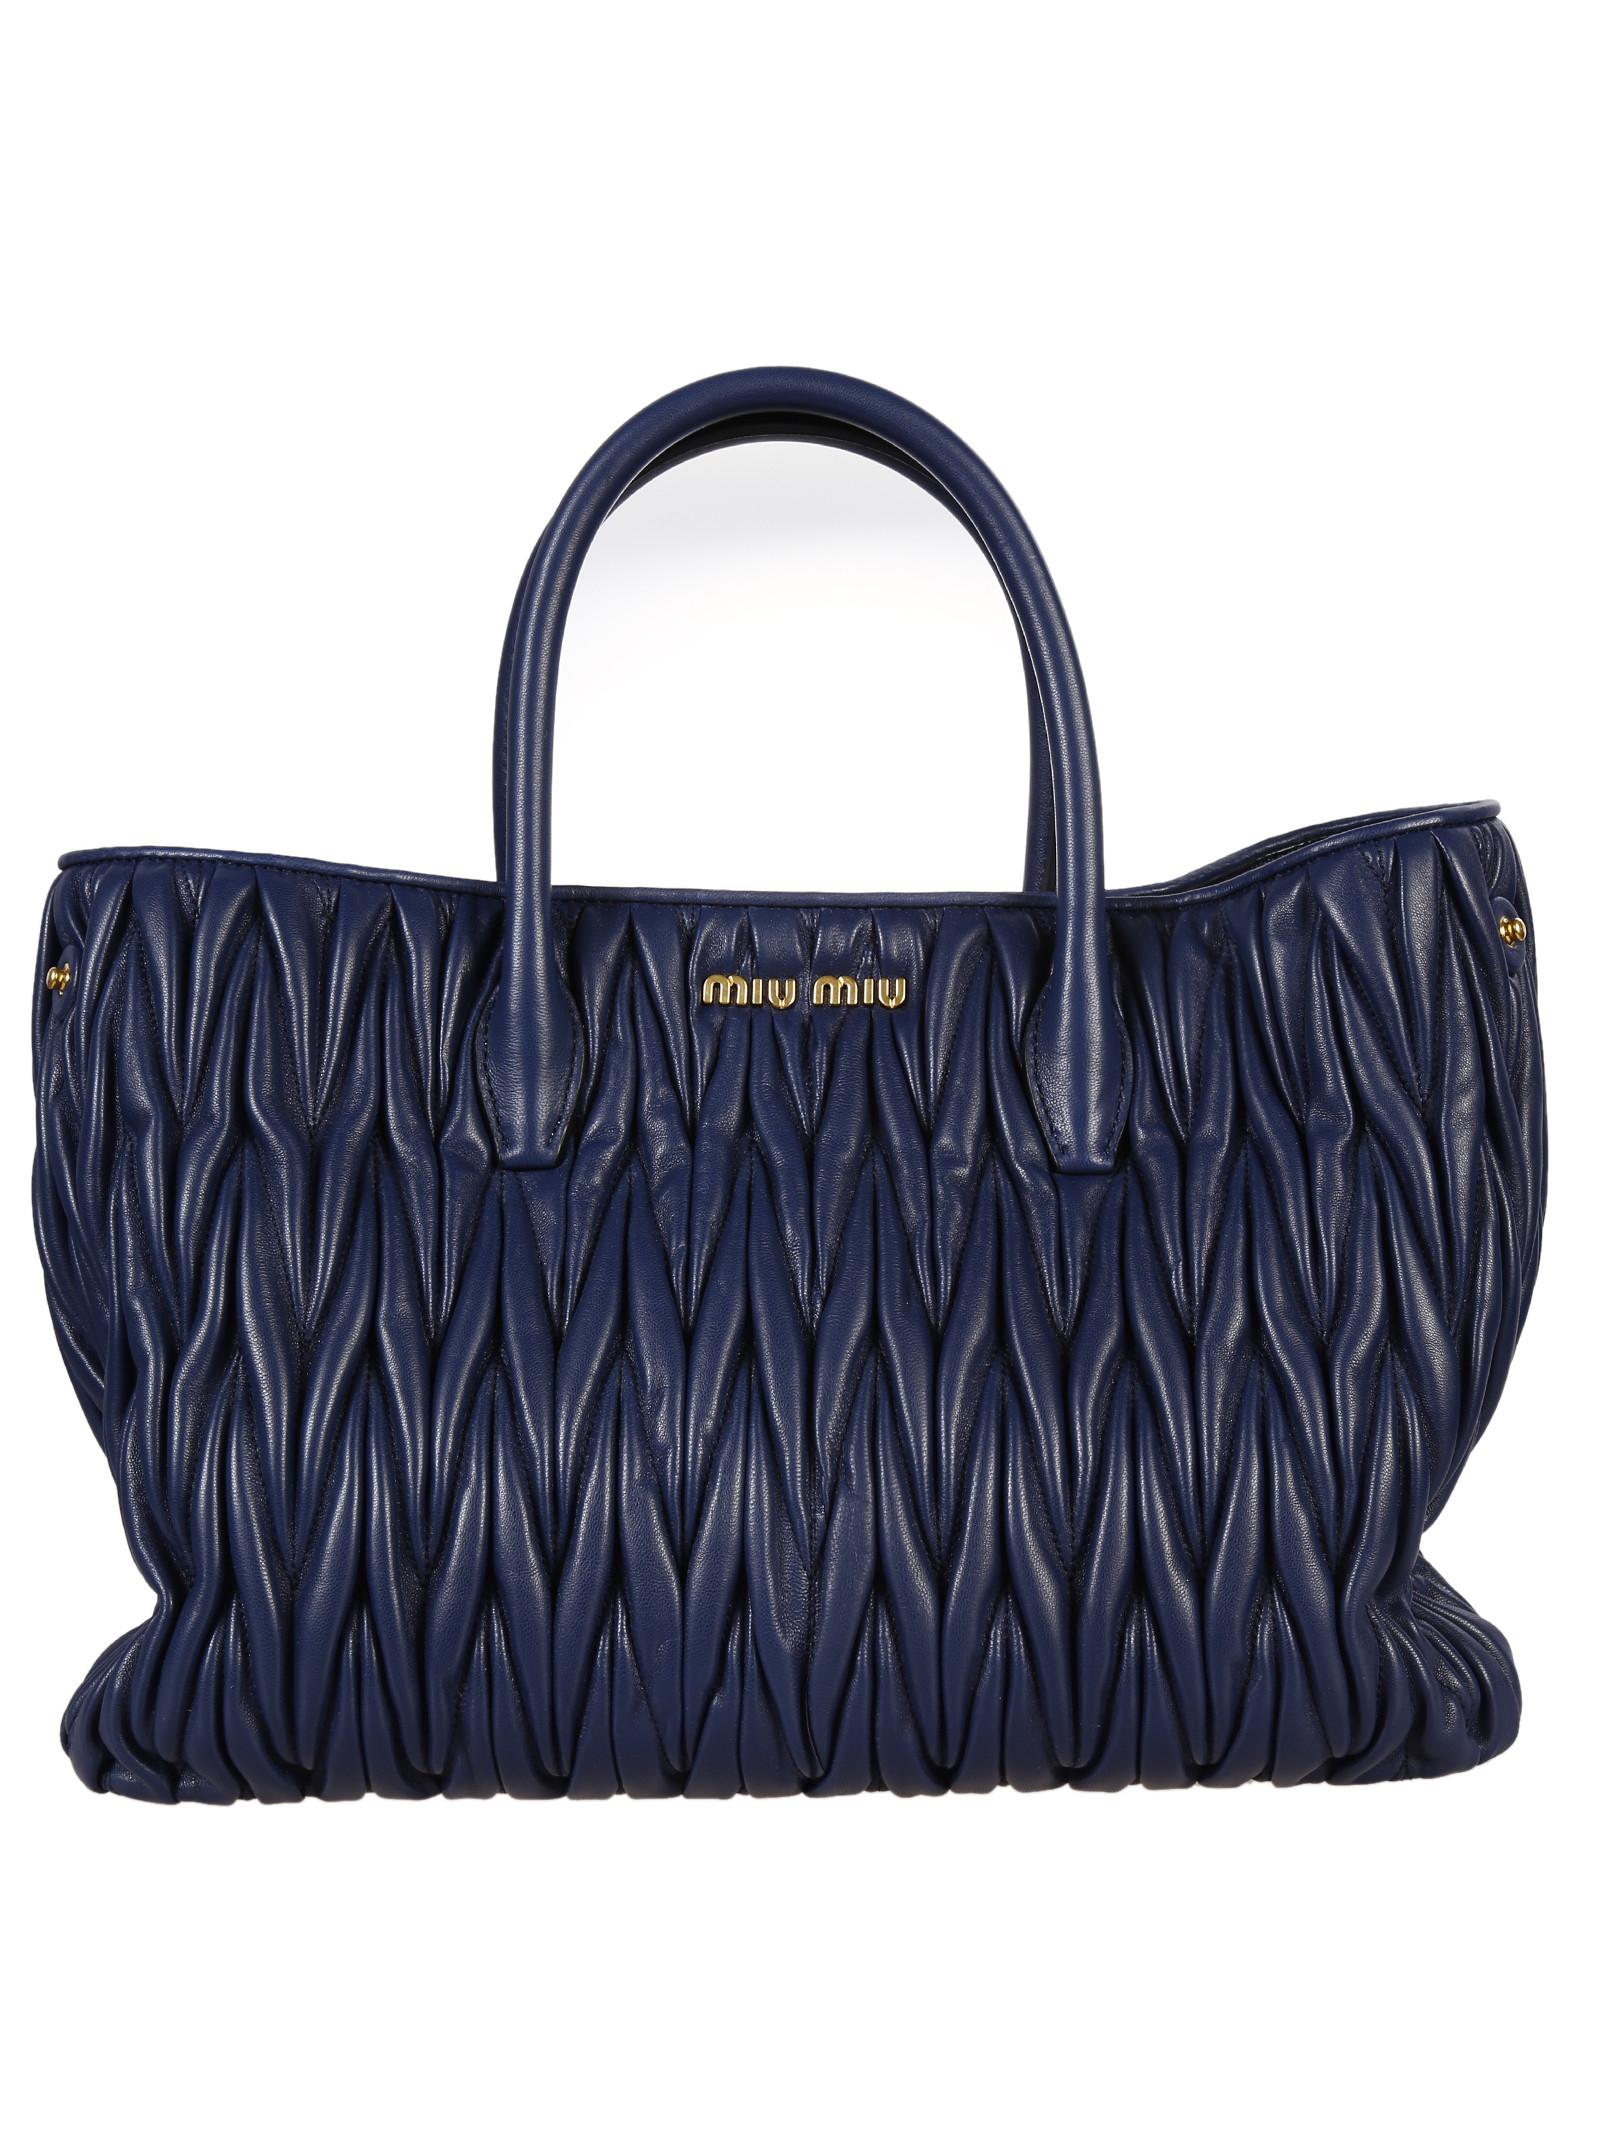 miu miu matelass big shopping bag in blue navy lyst. Black Bedroom Furniture Sets. Home Design Ideas